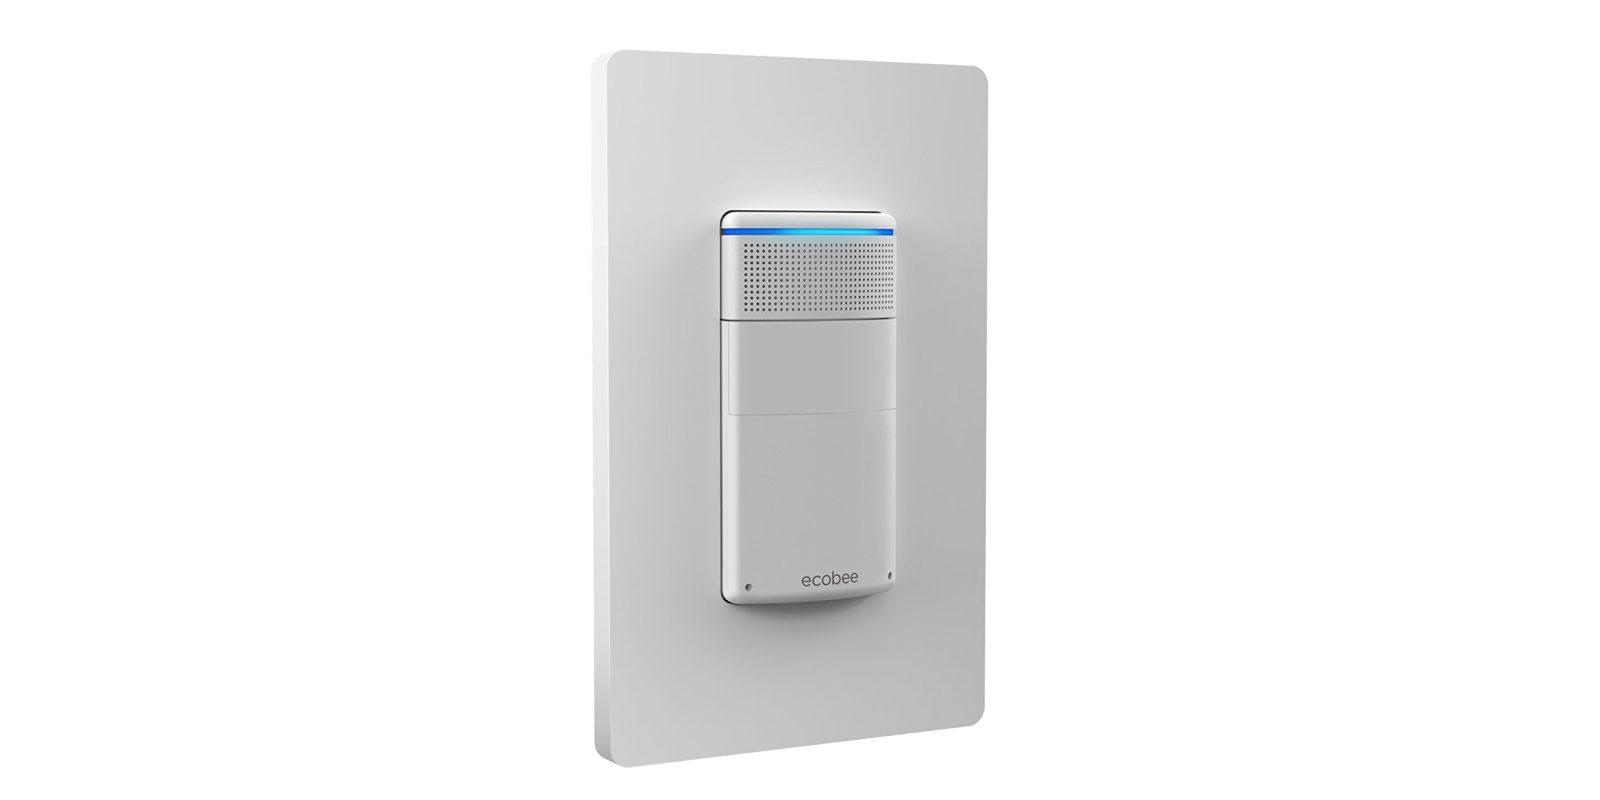 Ecobee S Switch Smart Light Switch Includes An Alexa